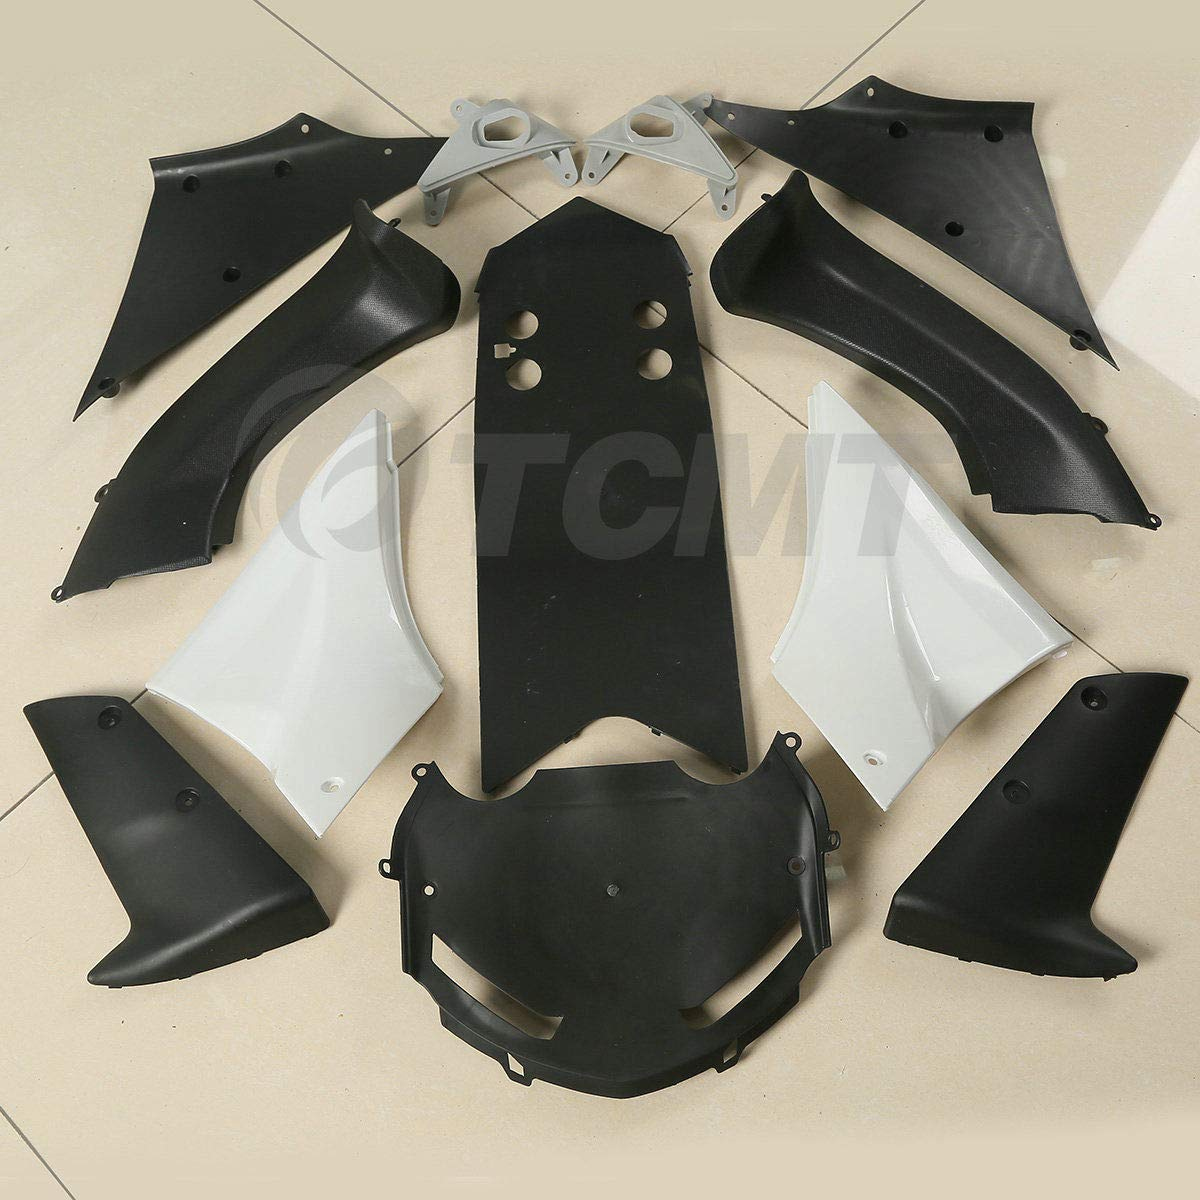 TCMT Injection ABS Unpainted Fairing Bodywork Kit Fits For Kawasaki Ninja ZX10R 2006 2007